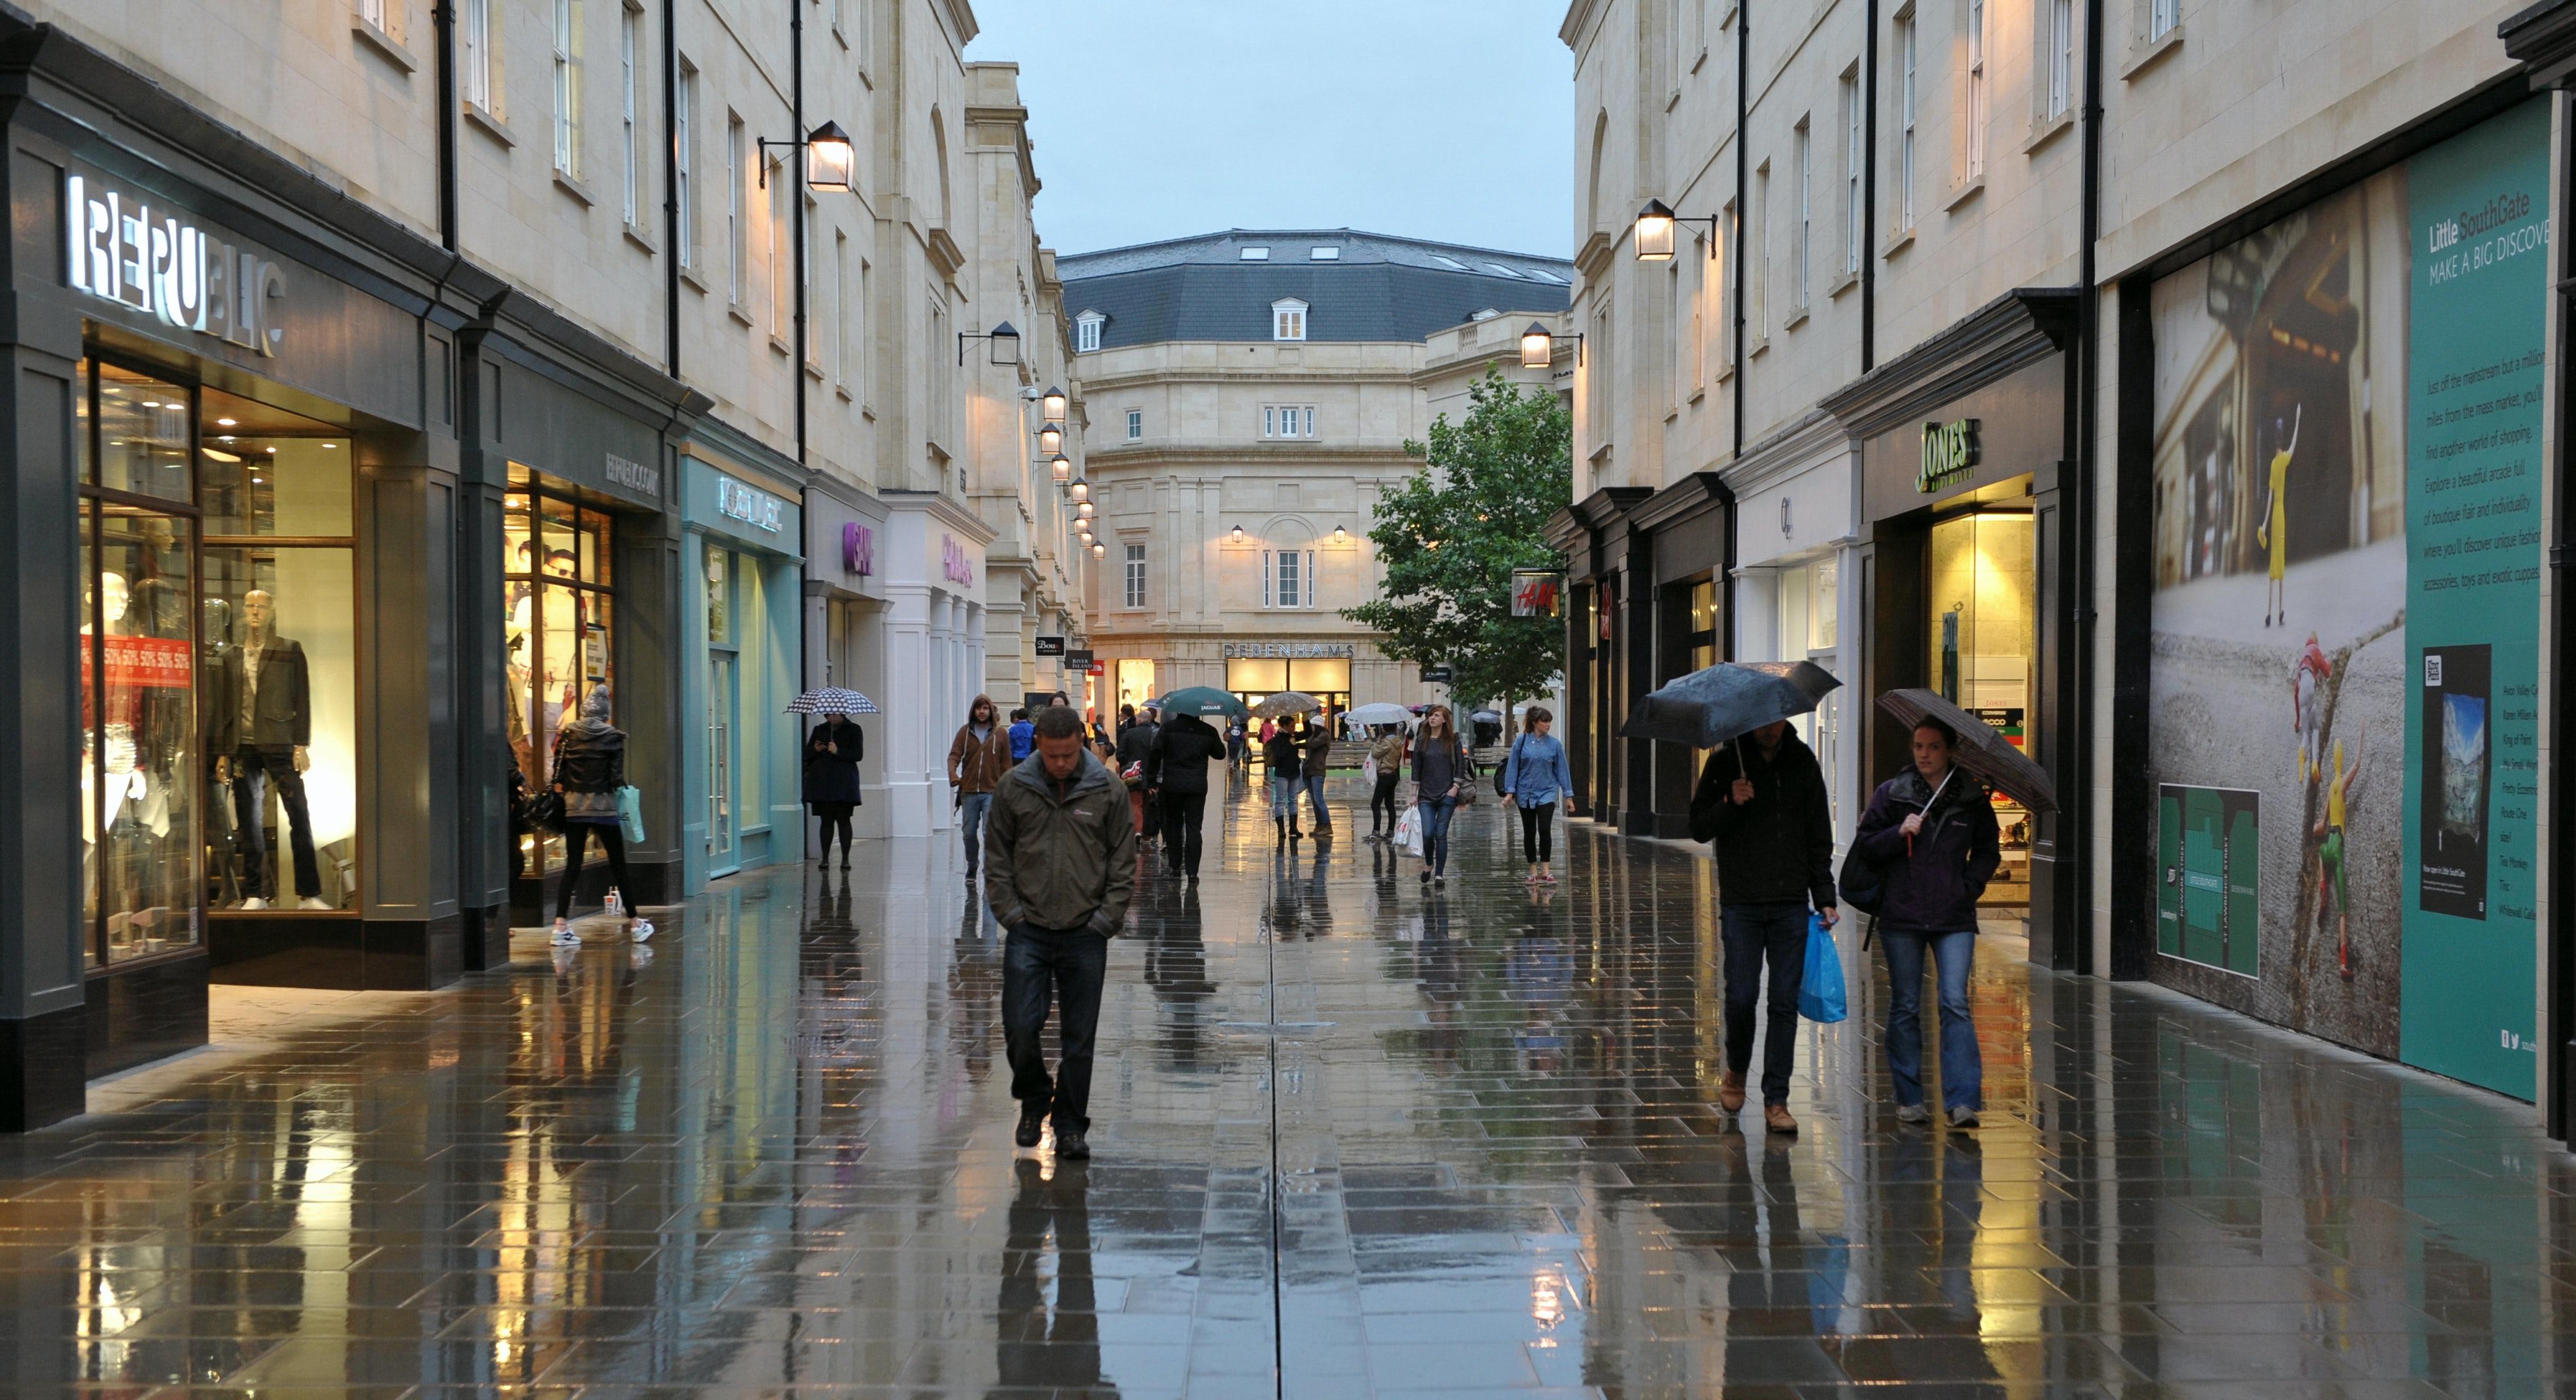 High street in Bath, United Kingdom | Source: Shutterstock